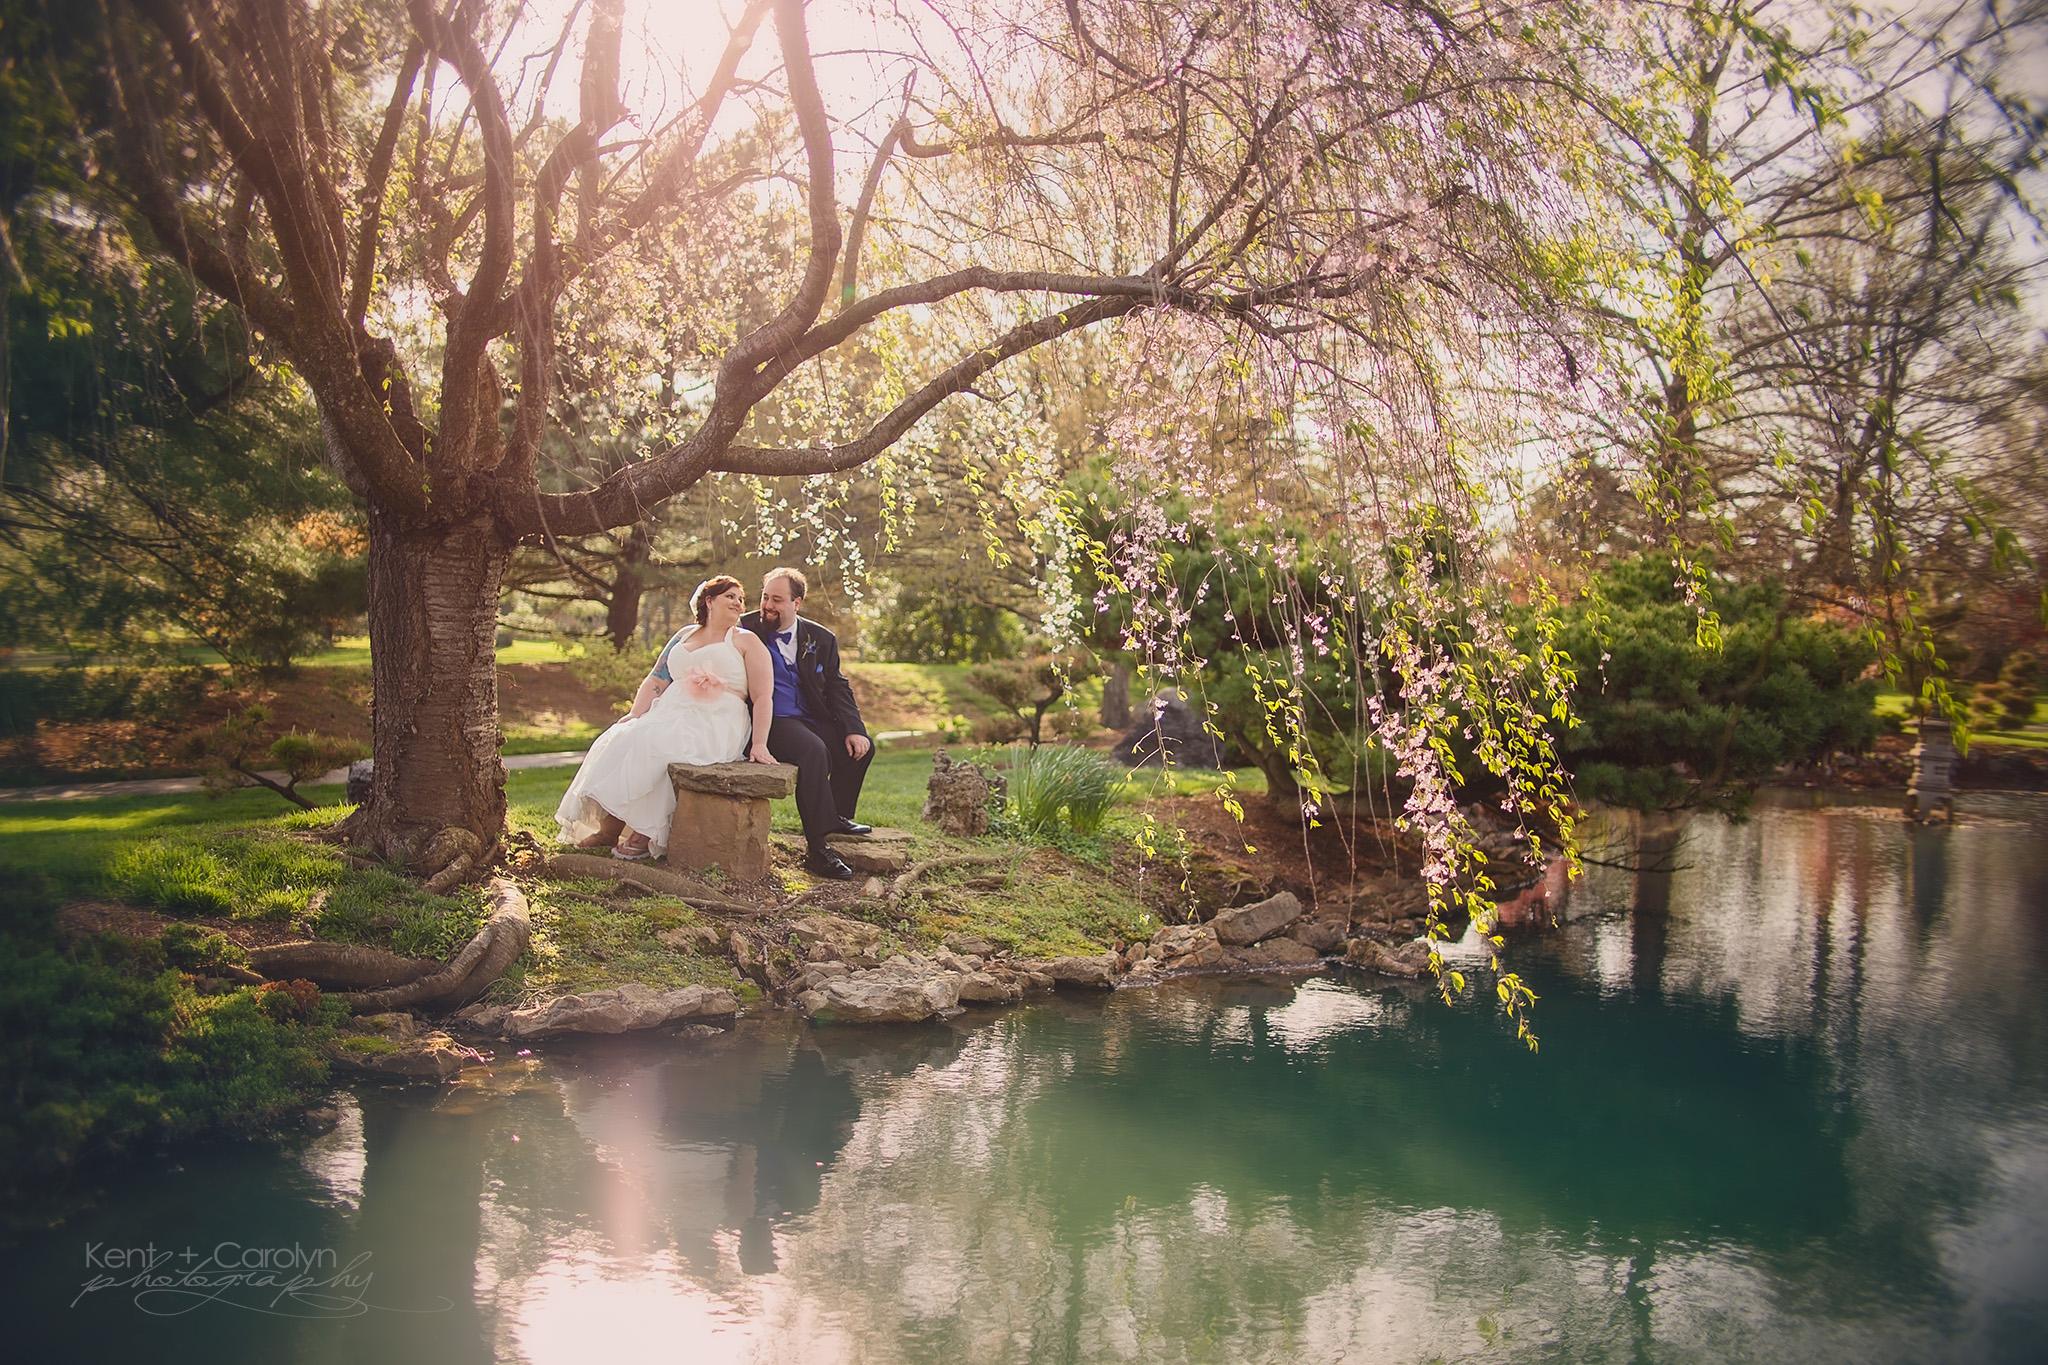 Spring wedding in the cherry blossoms at Mizumoto Japanese Stroll Garden, Springfield, MO